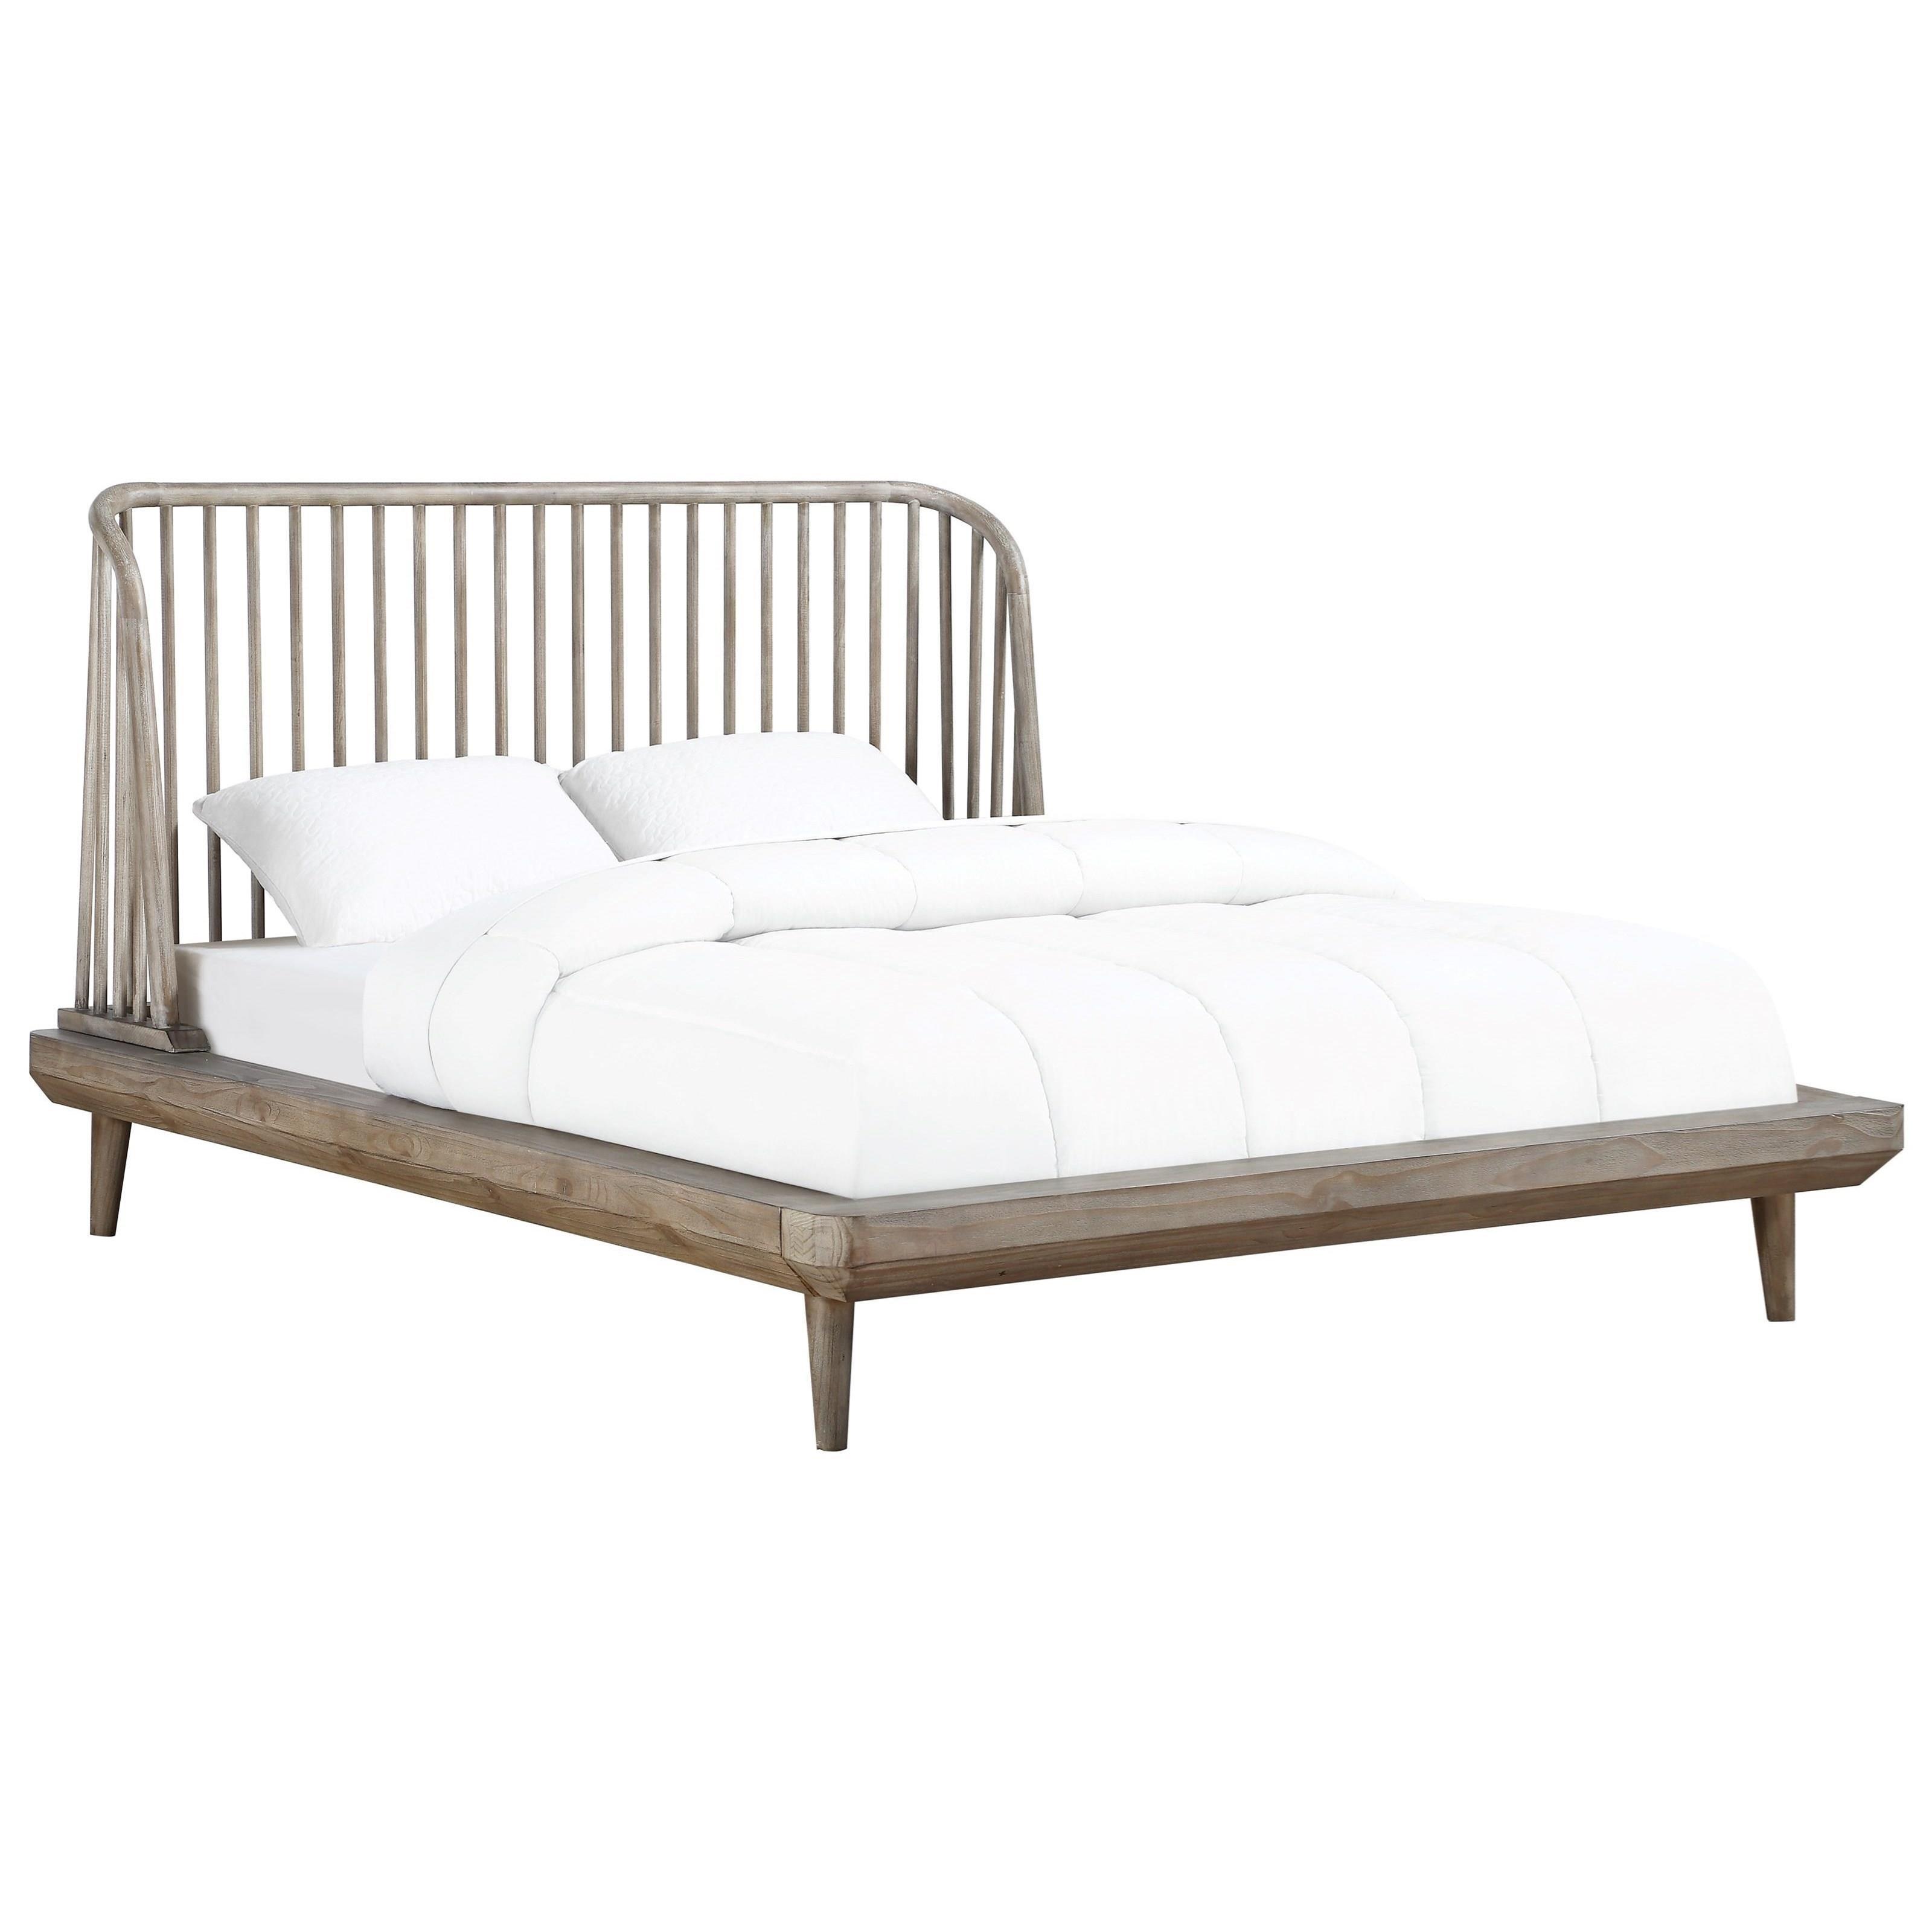 Picture of: Spindle California King Platform Bed With Spindle Headboard Sadler S Home Furnishings Platform Beds Low Profile Beds